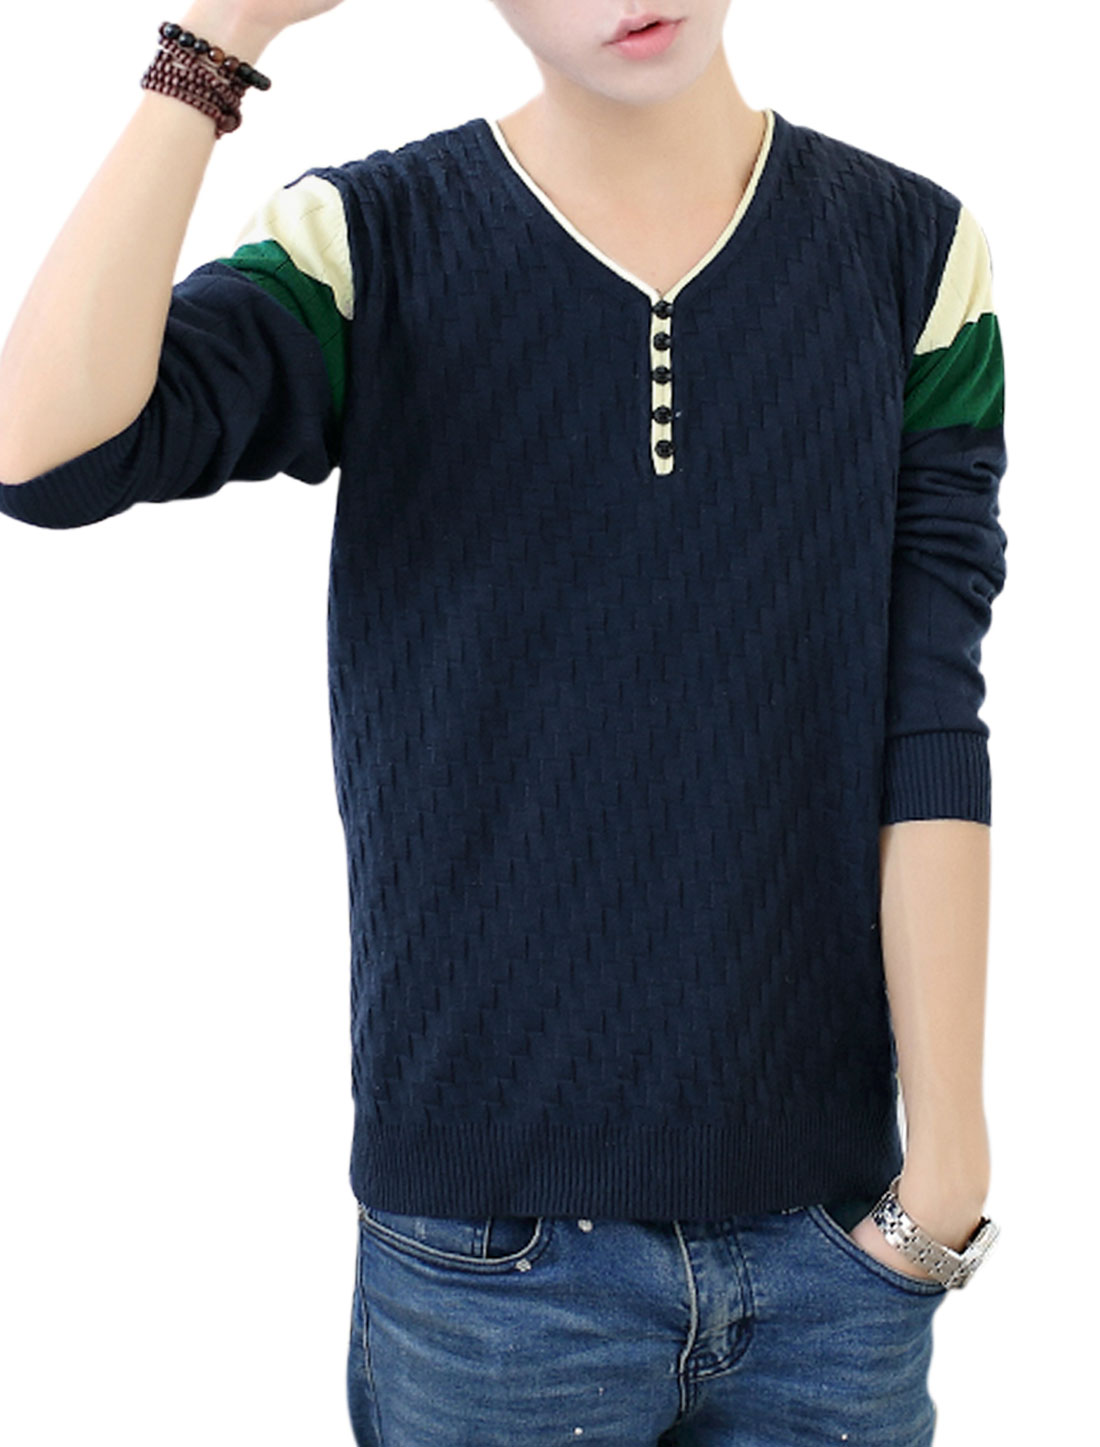 Men Navy Blue Pullover Weaven Pattern Button Decor Long Sleeves Knit Shirt S